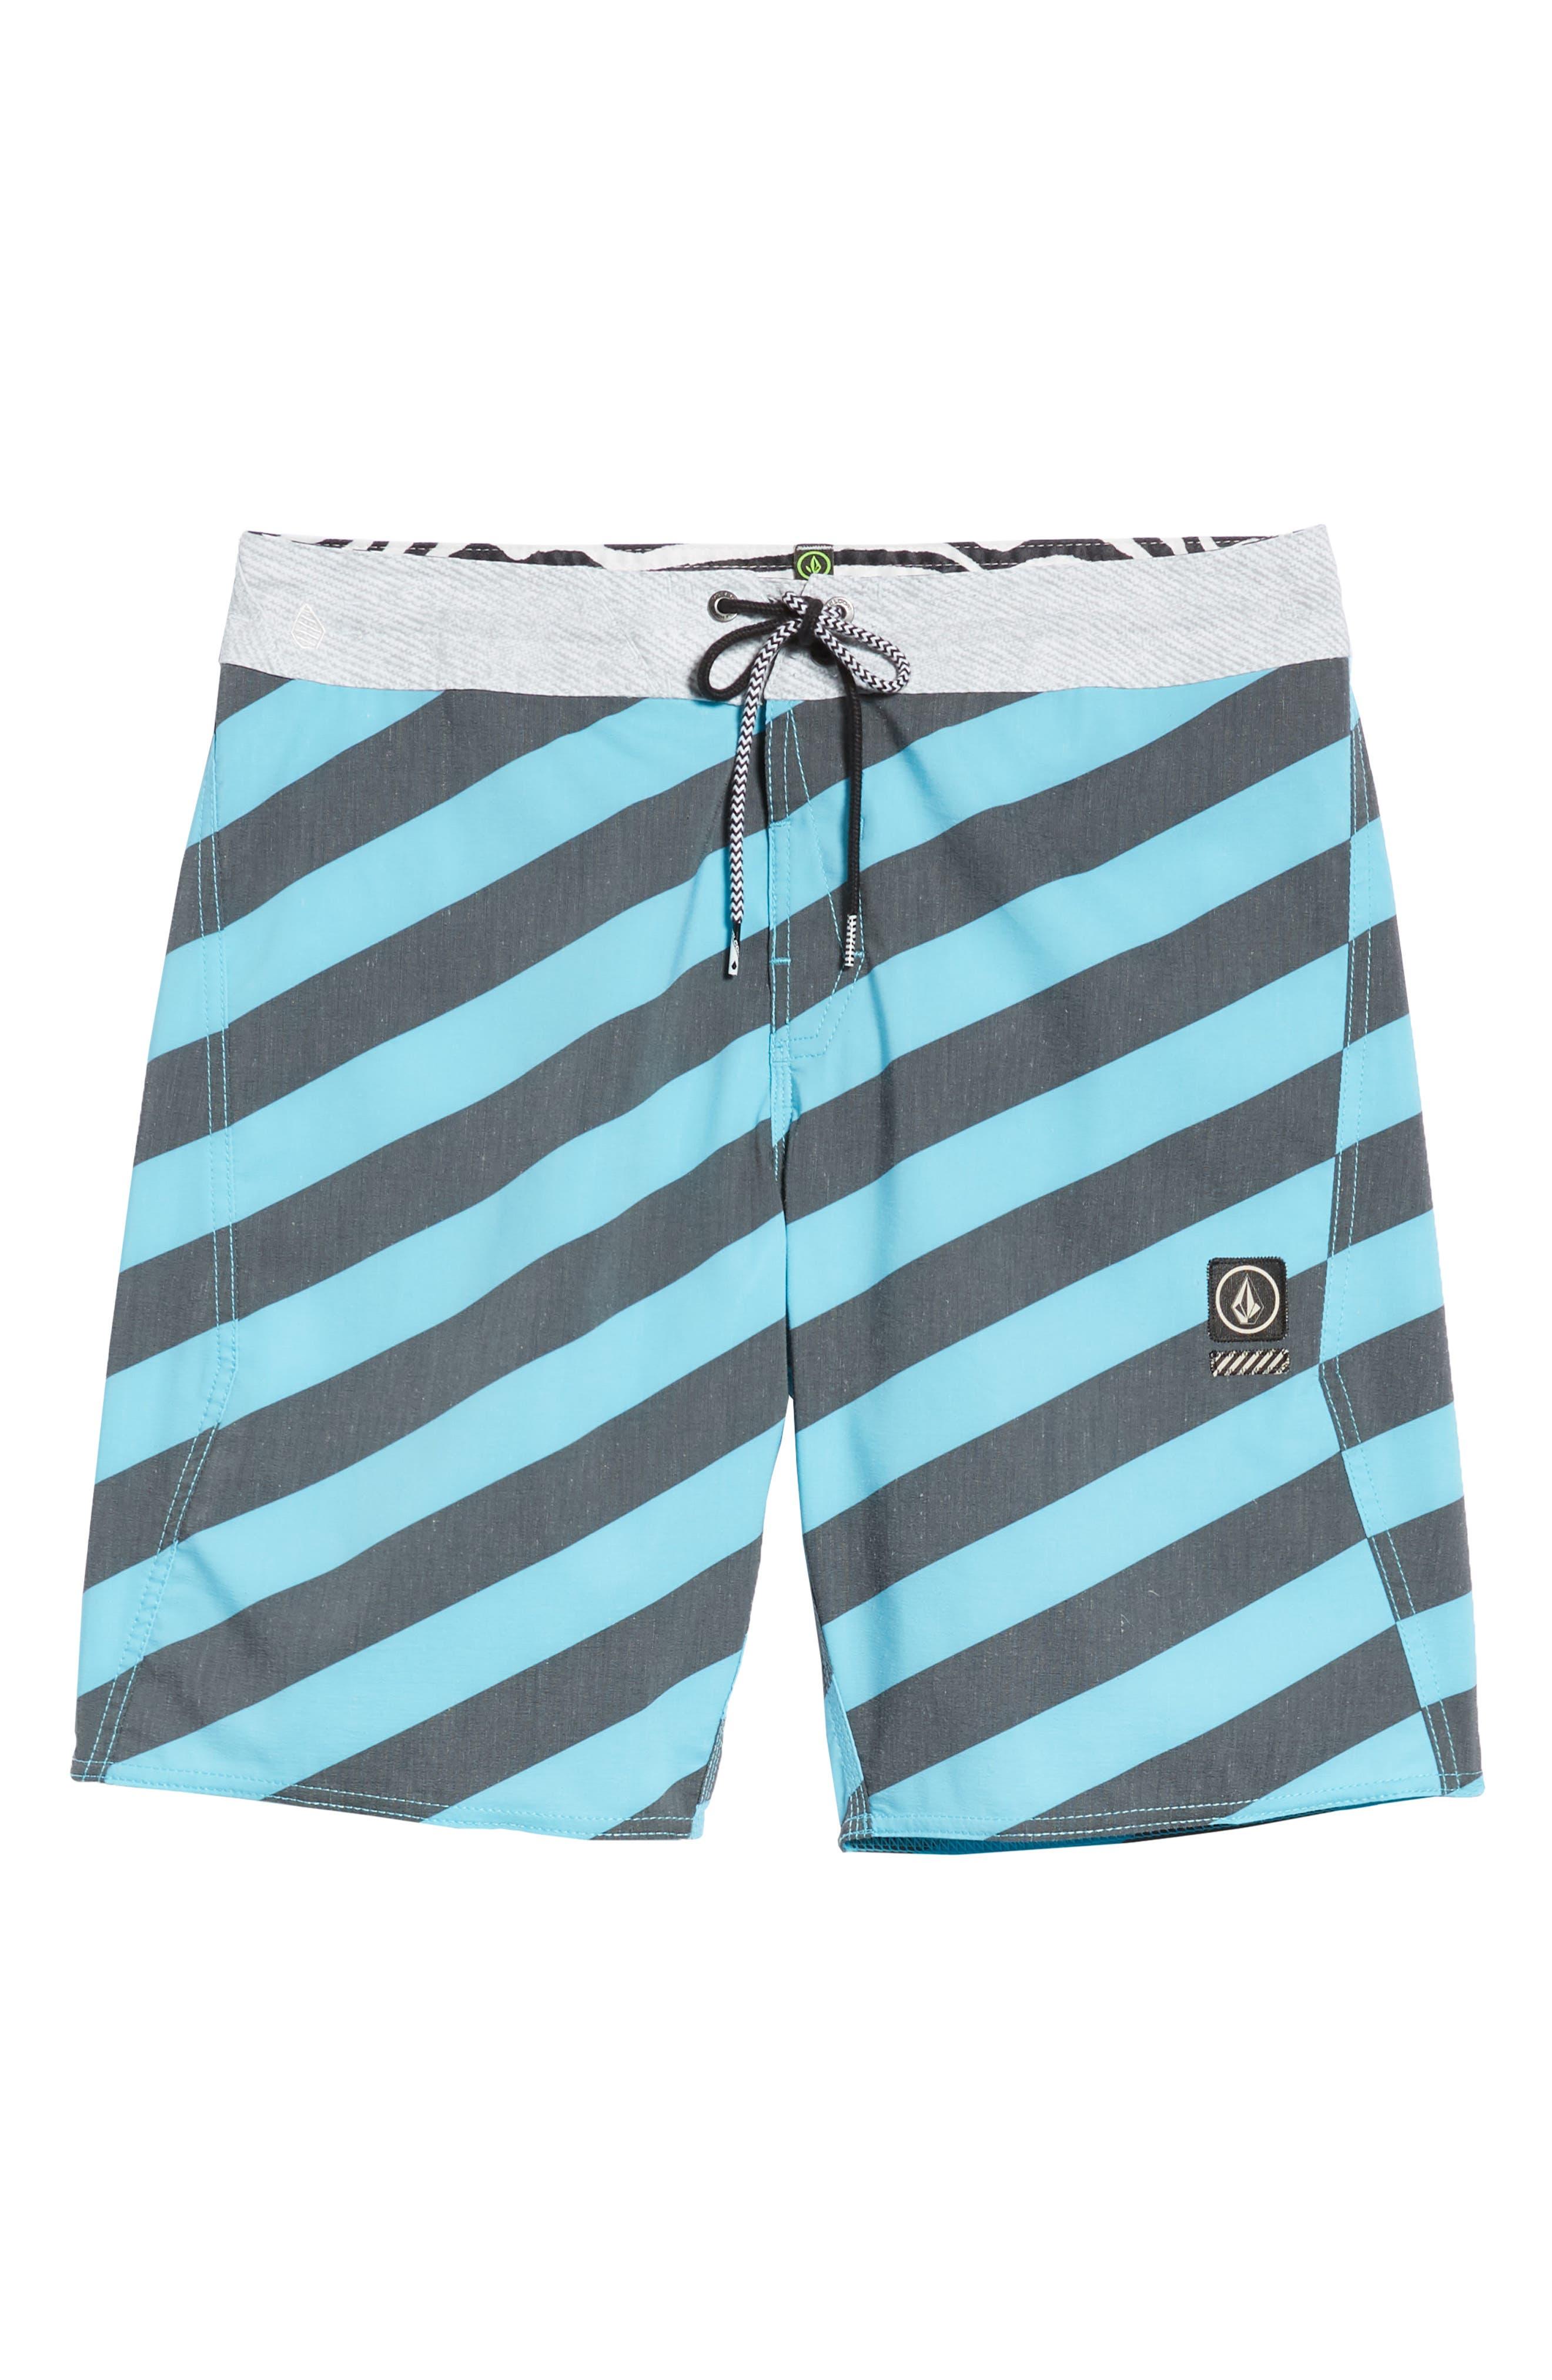 Stripey Stoney Boardshorts,                             Alternate thumbnail 6, color,                             470